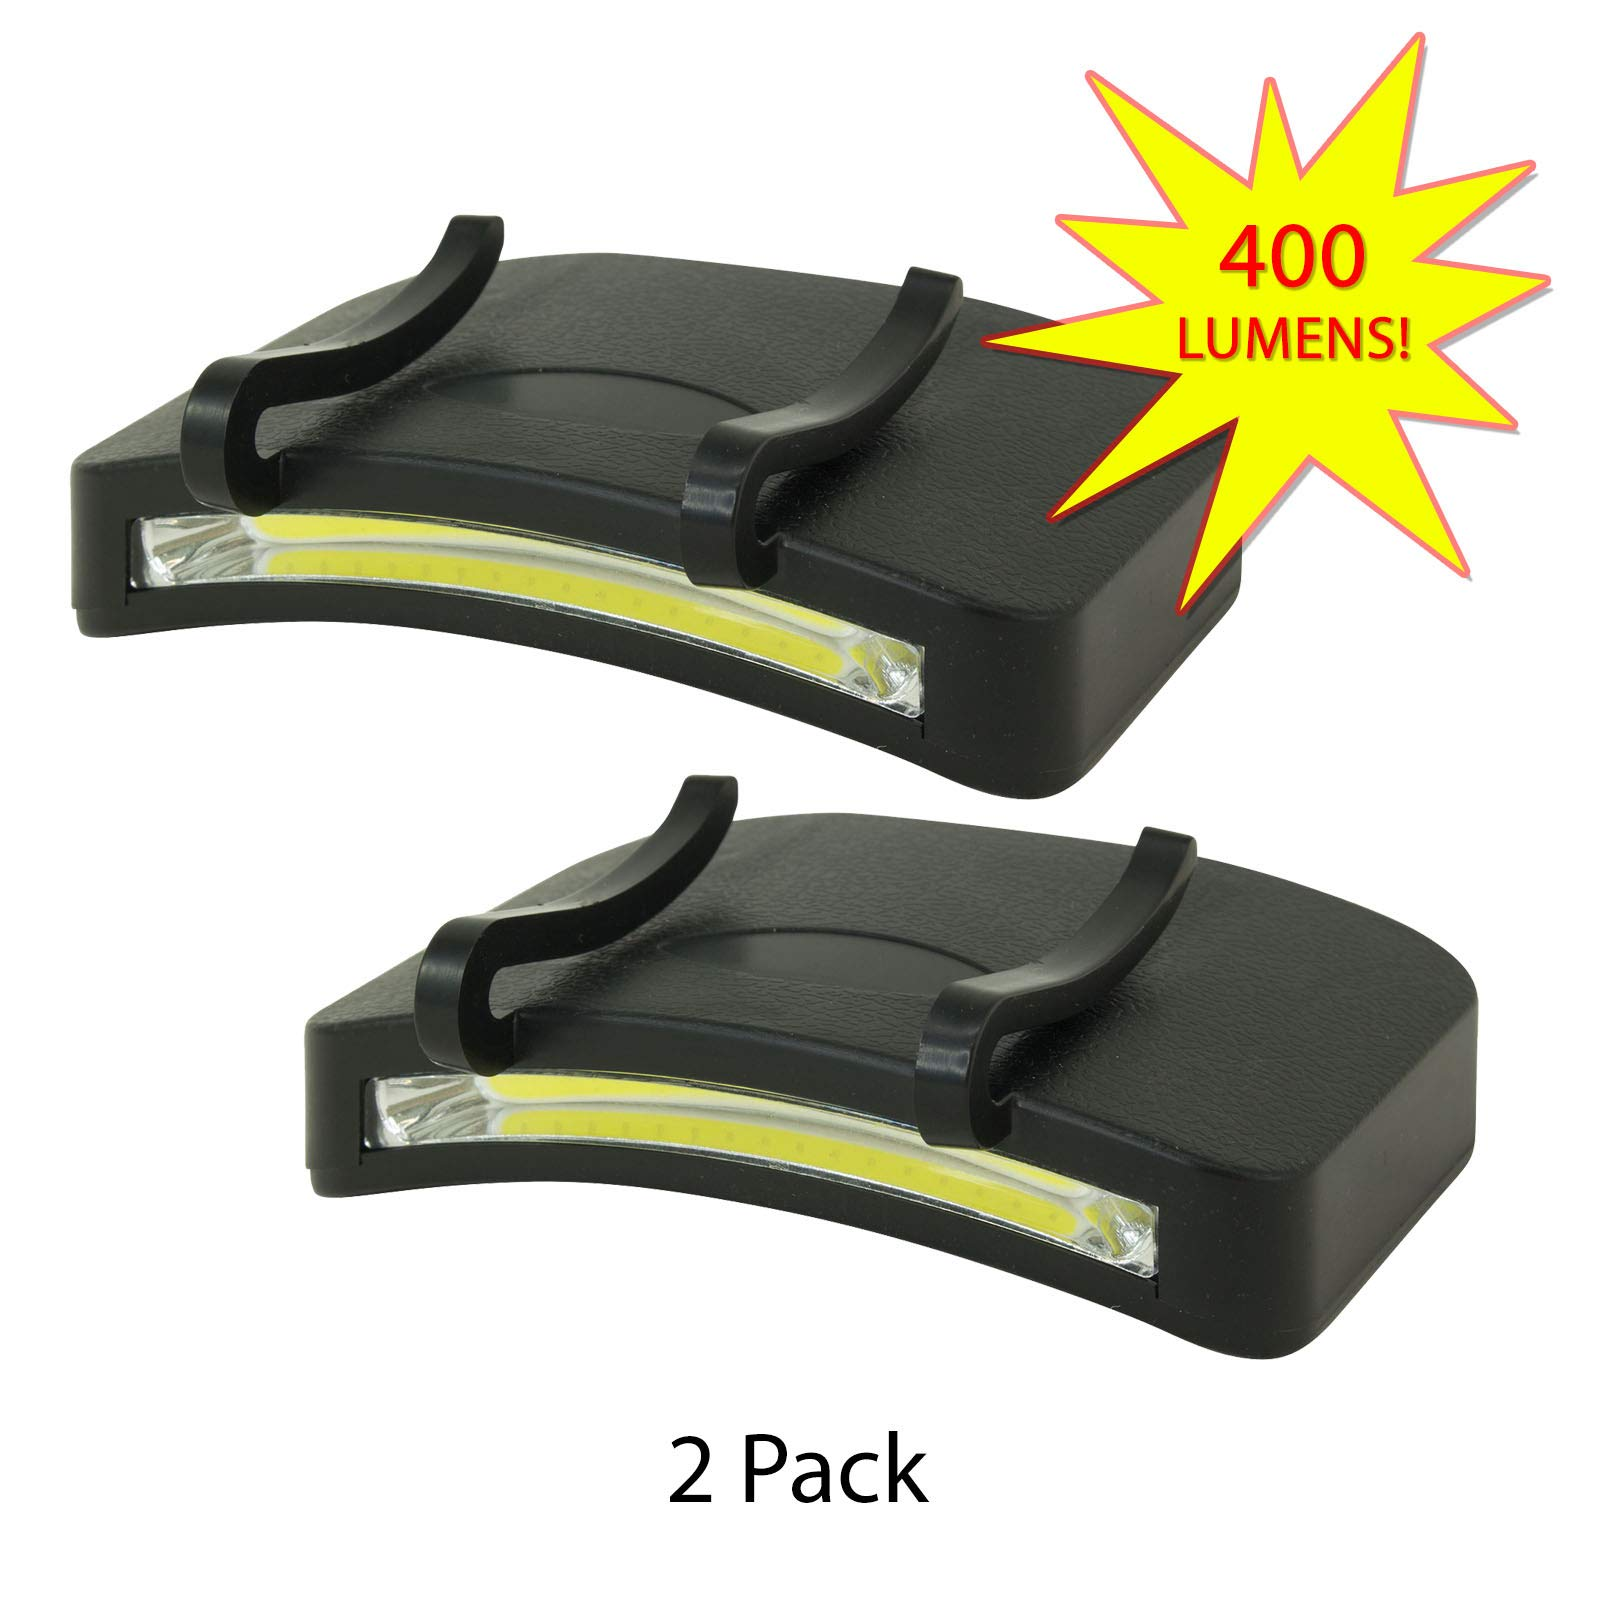 2 PACK - 400 Lumen Hi Mode / 180 Lumen Low Power Mode (2 X Cap Lights > 2 X Power & 2 X Bright) COB LED Clip On Cap Light DOUBLE BRIGHT (100% MFG Guarantee) (Black) by Apollo's Products (Image #1)